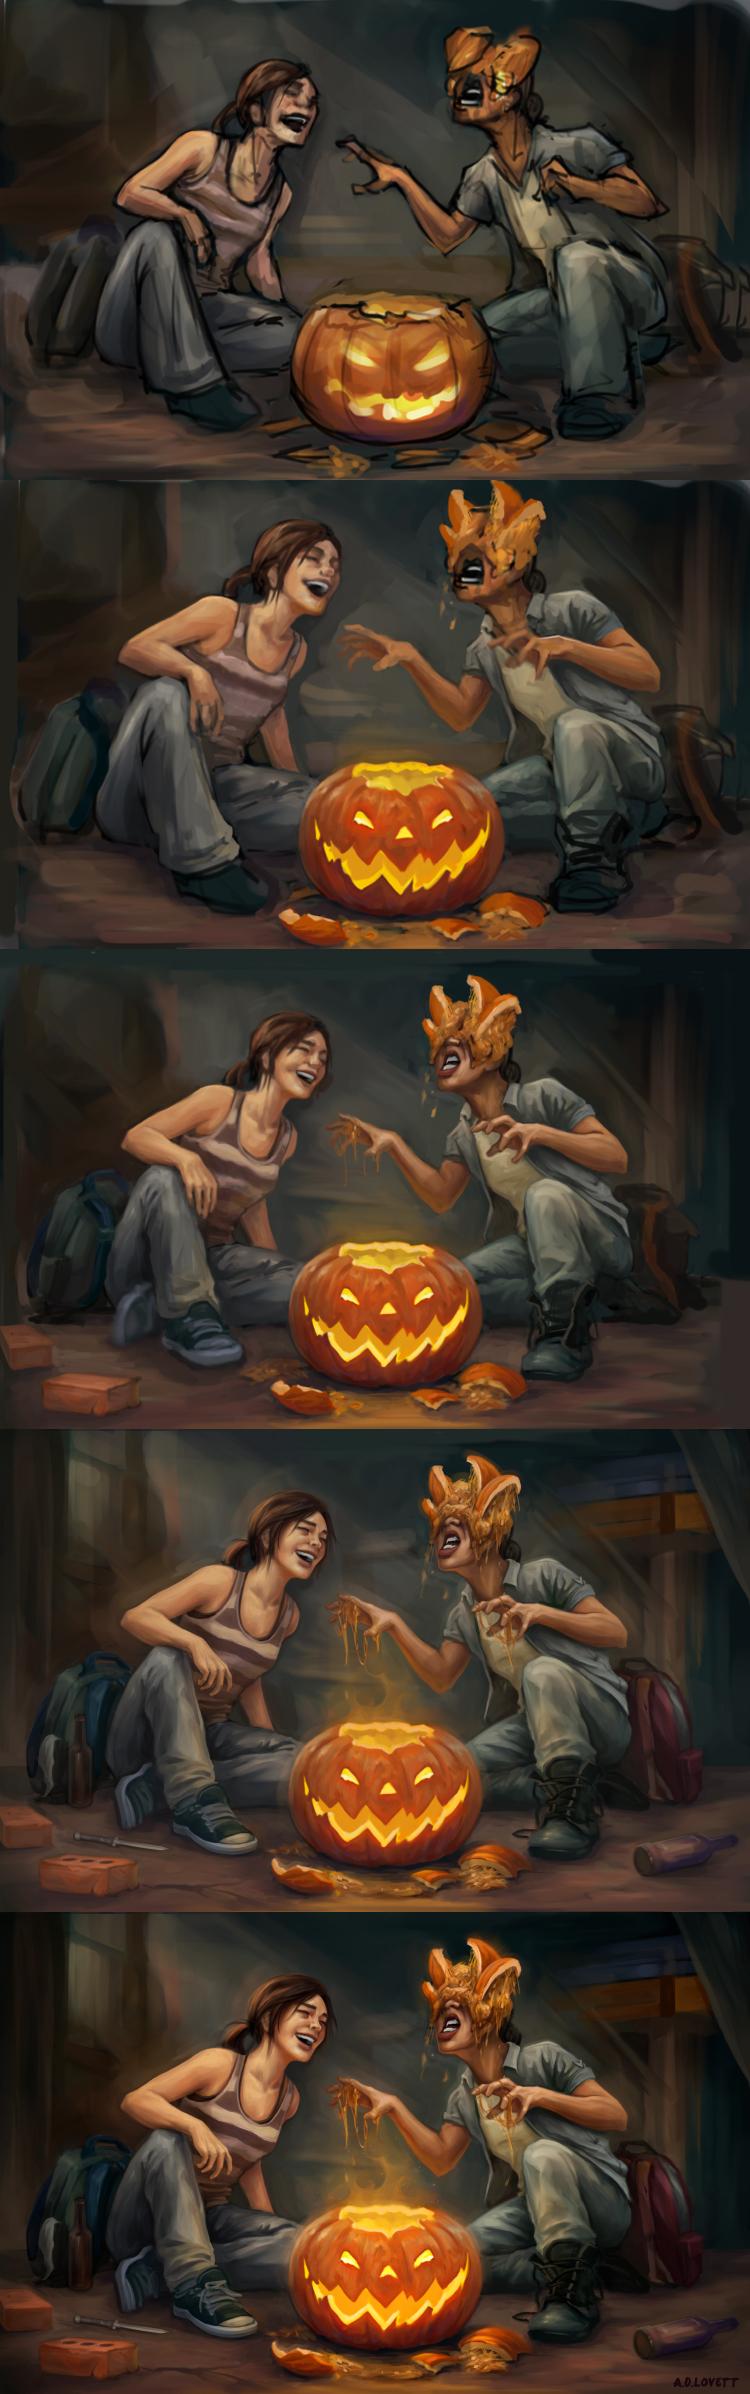 Last of Us: Halloween - Process